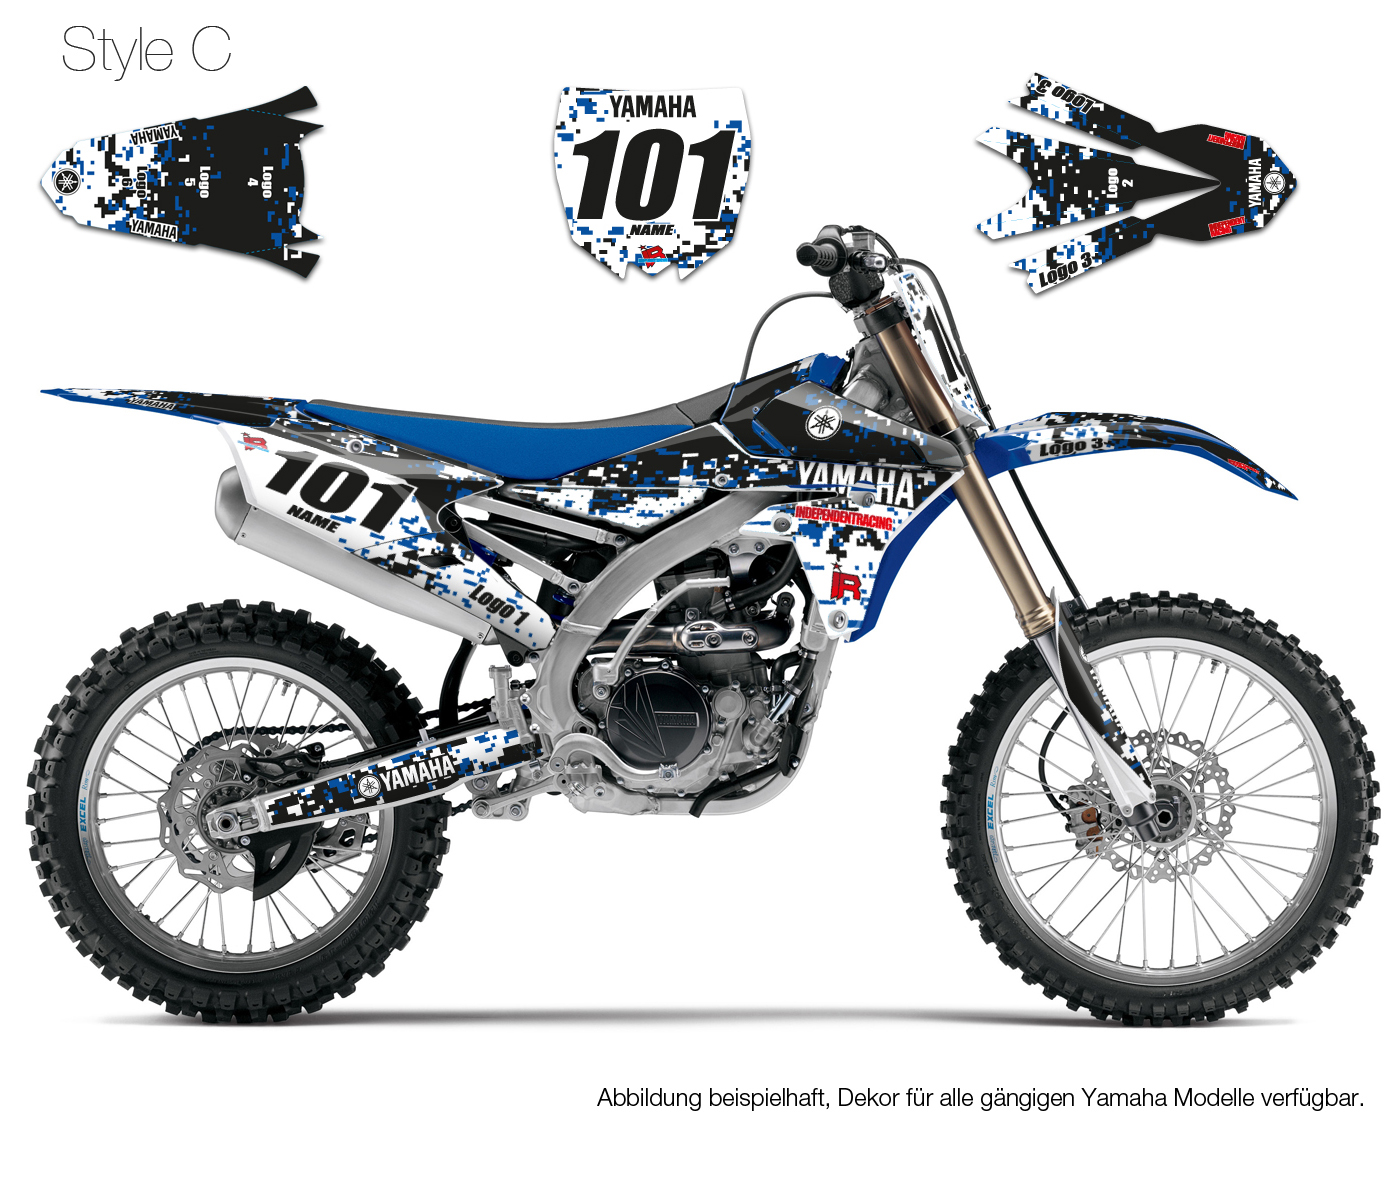 Dekor Yamaha Stock3